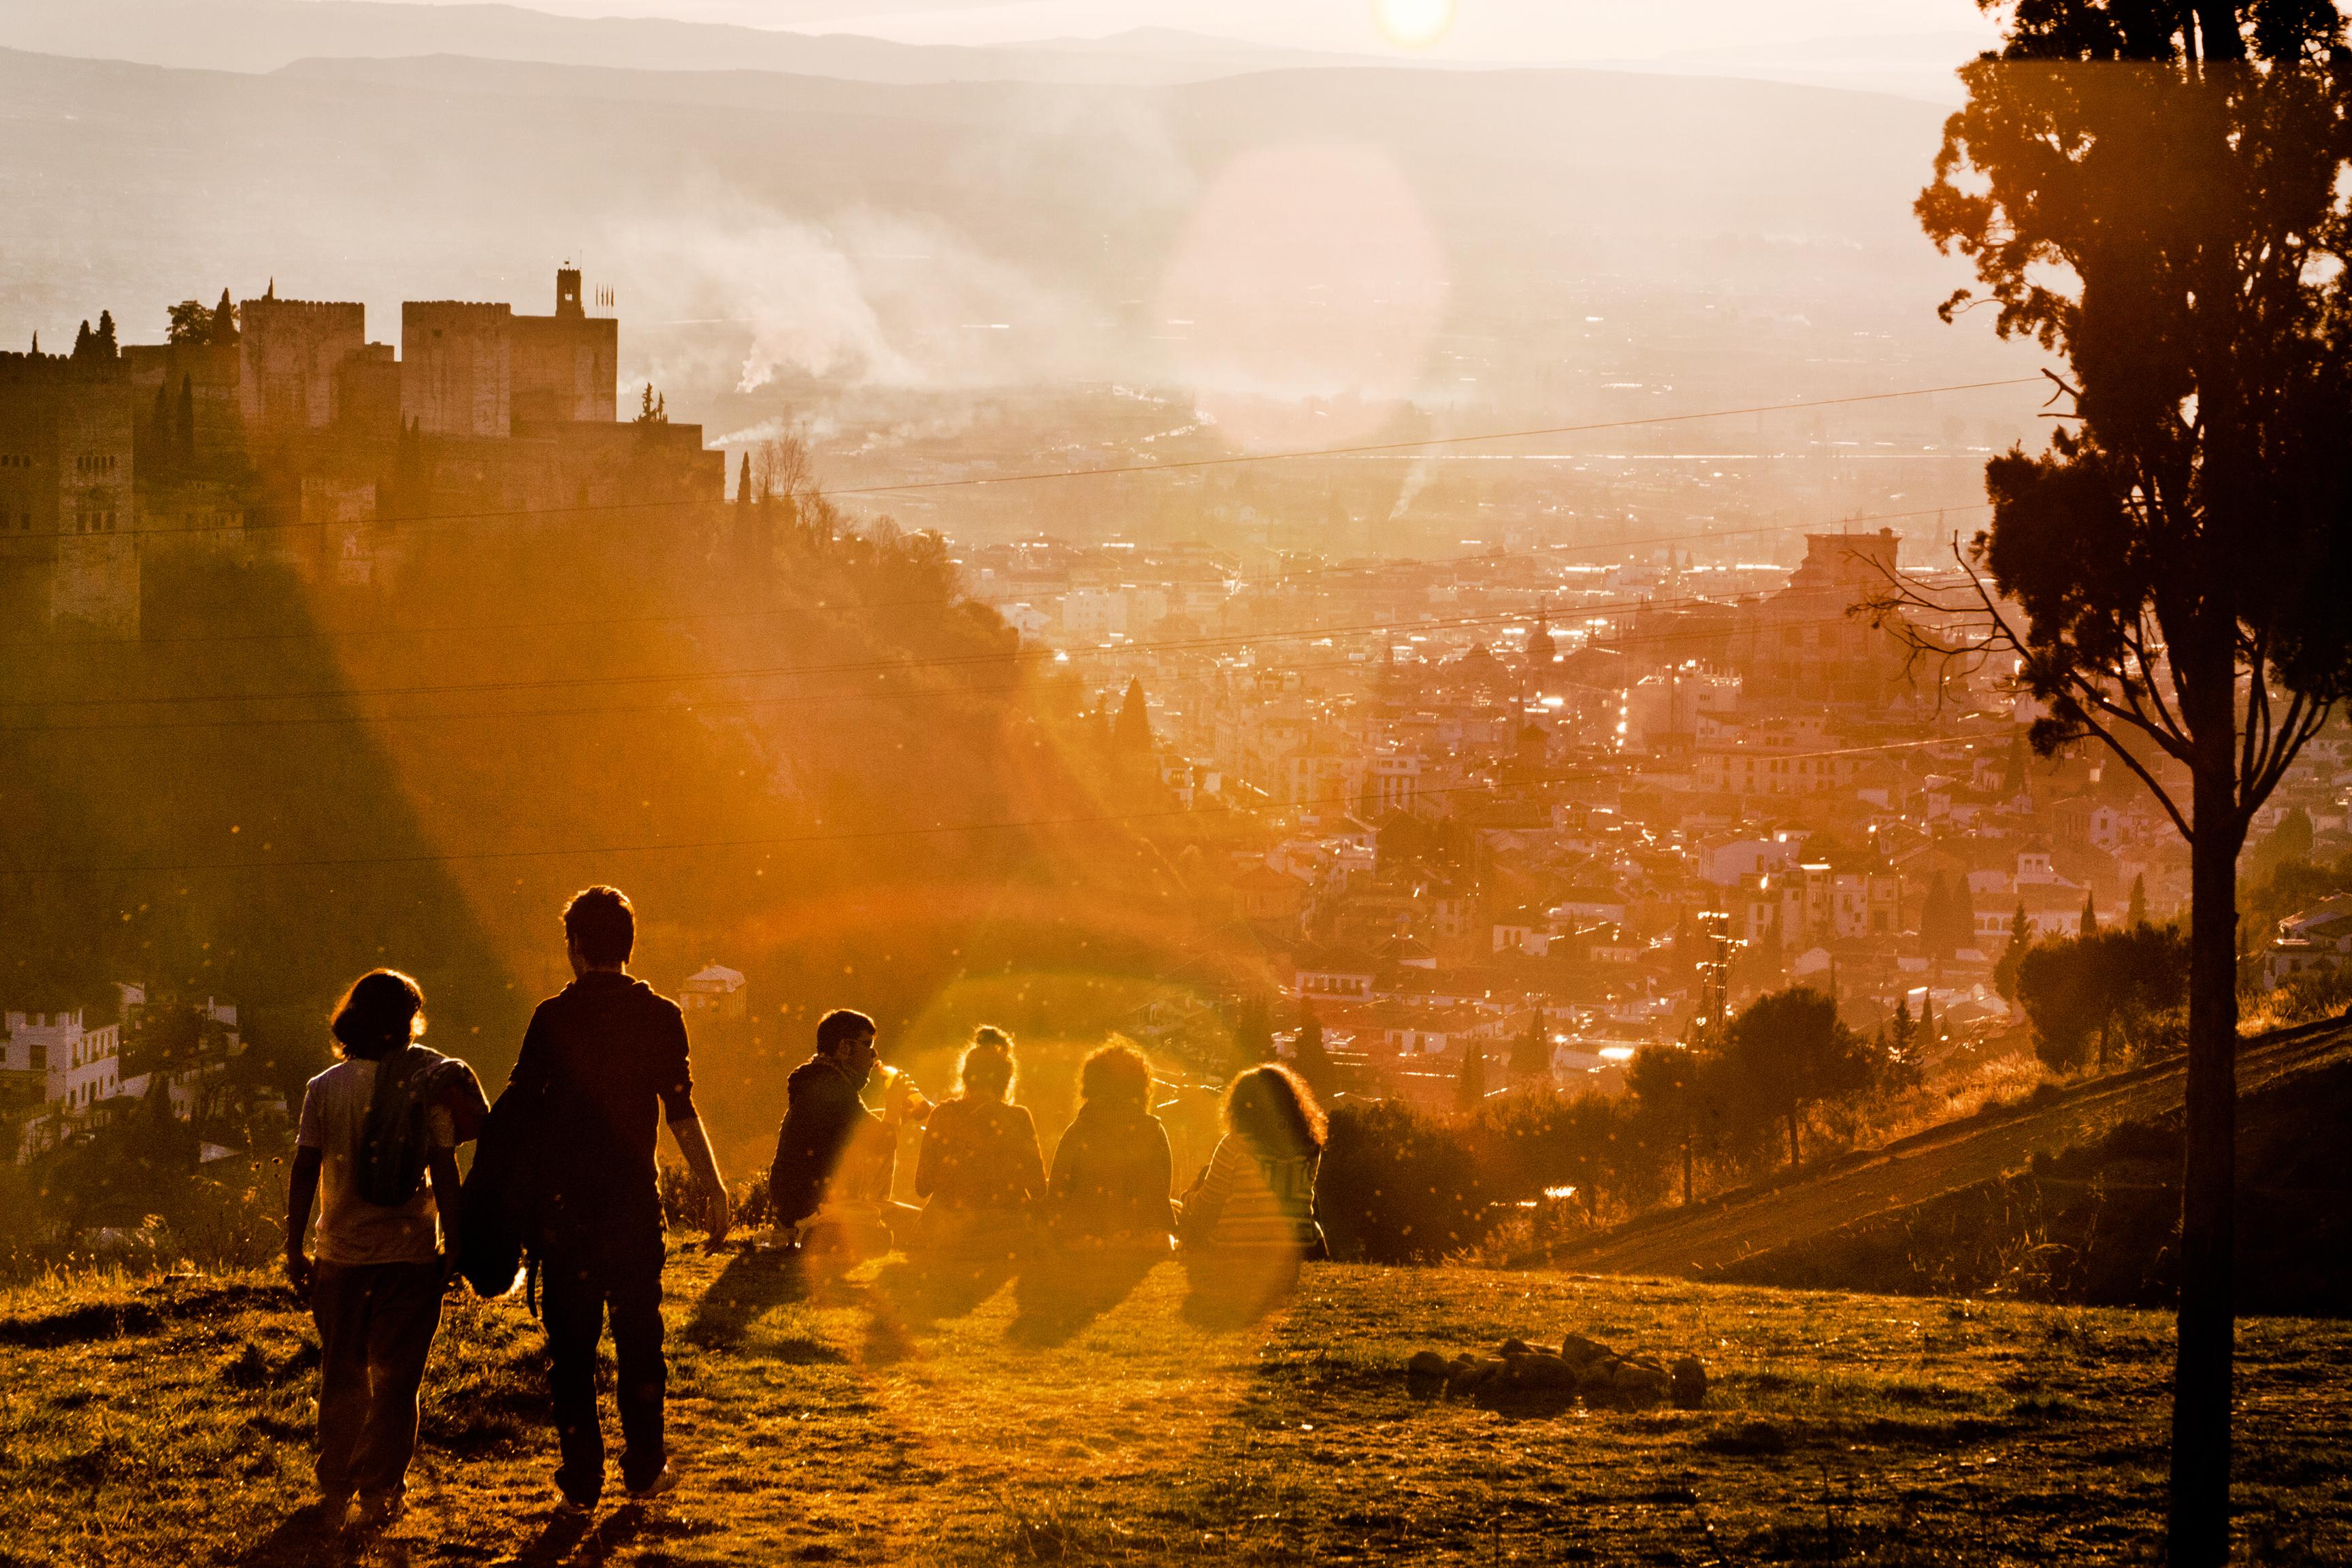 pemandangan kelompok orang orang matahari terbit matahari terbenam sinar matahari pagi melihat fajar malam refleksi